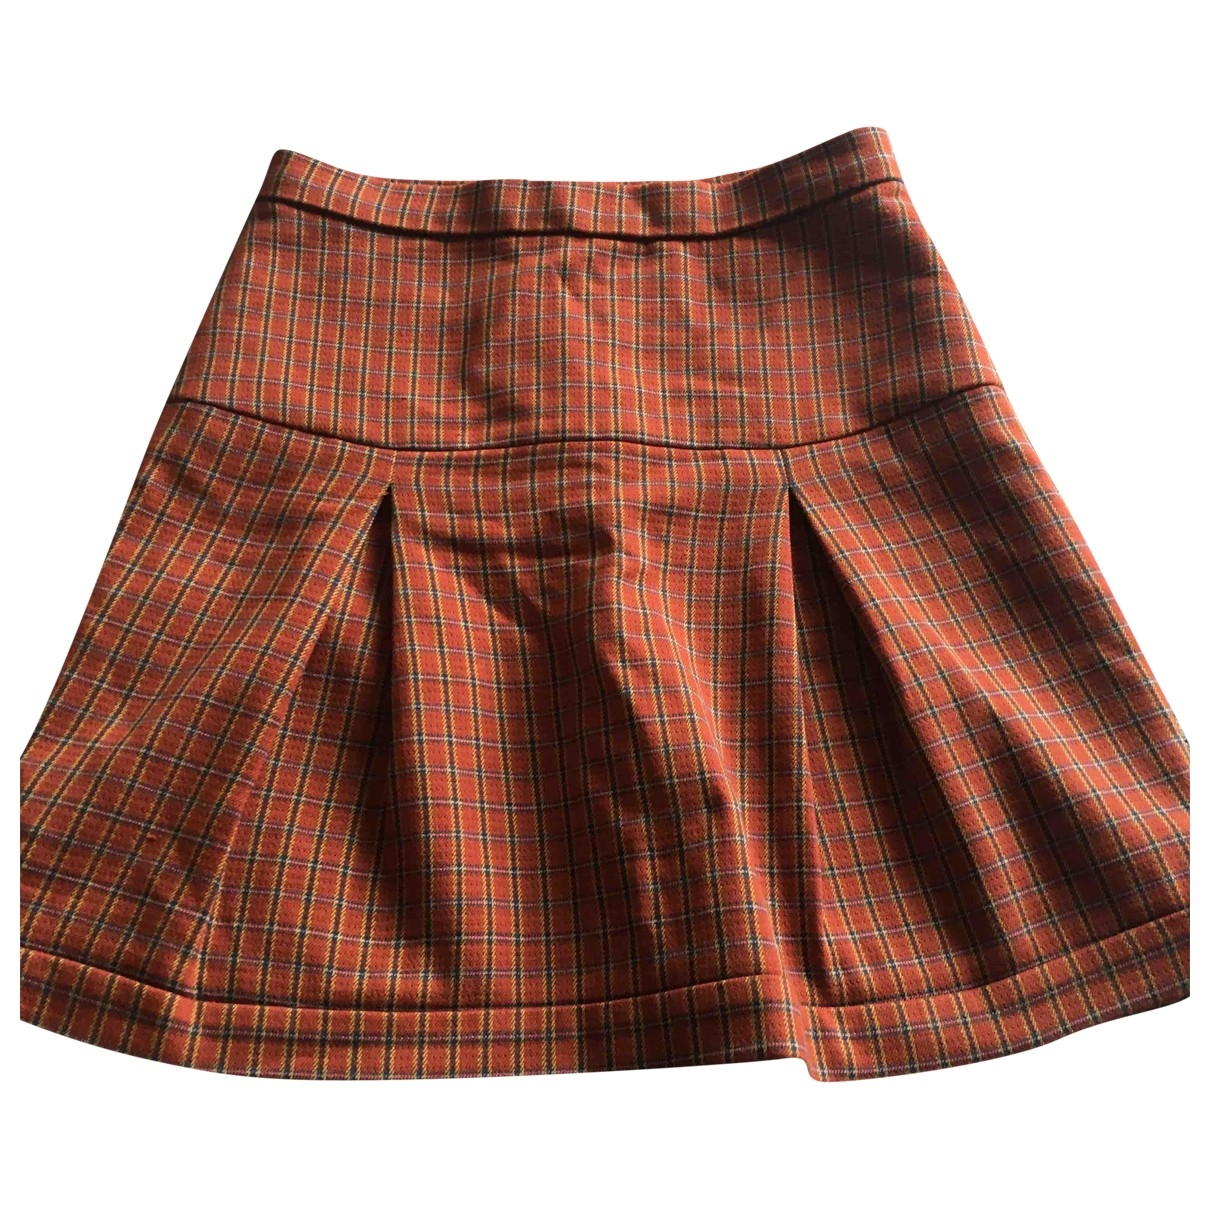 Bimba Y Lola \N Orange Cotton skirt for Women S International